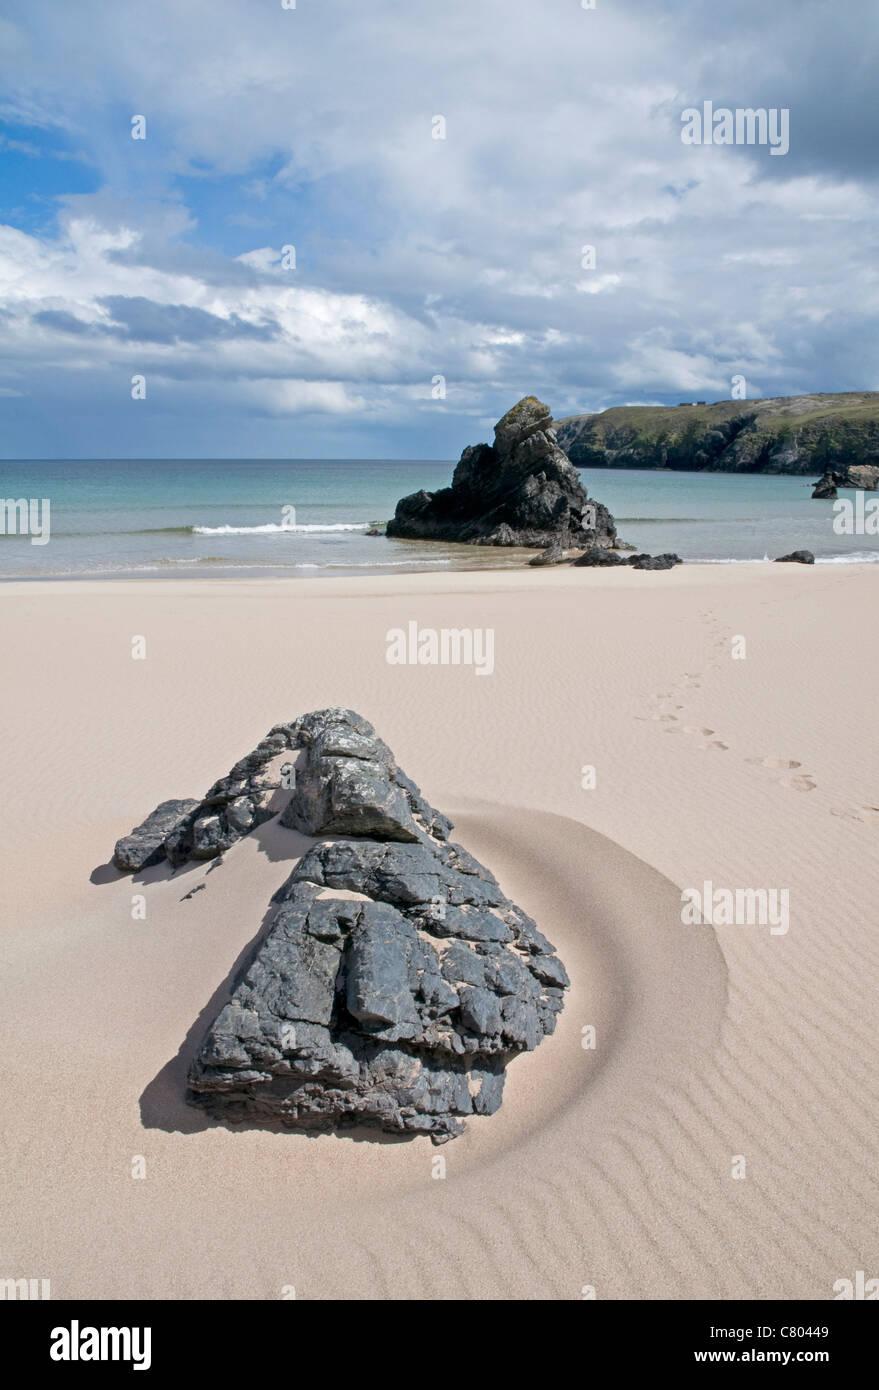 Idyllic deserted sandy beach at Sango Bay in the far north of Scotland - Stock Image